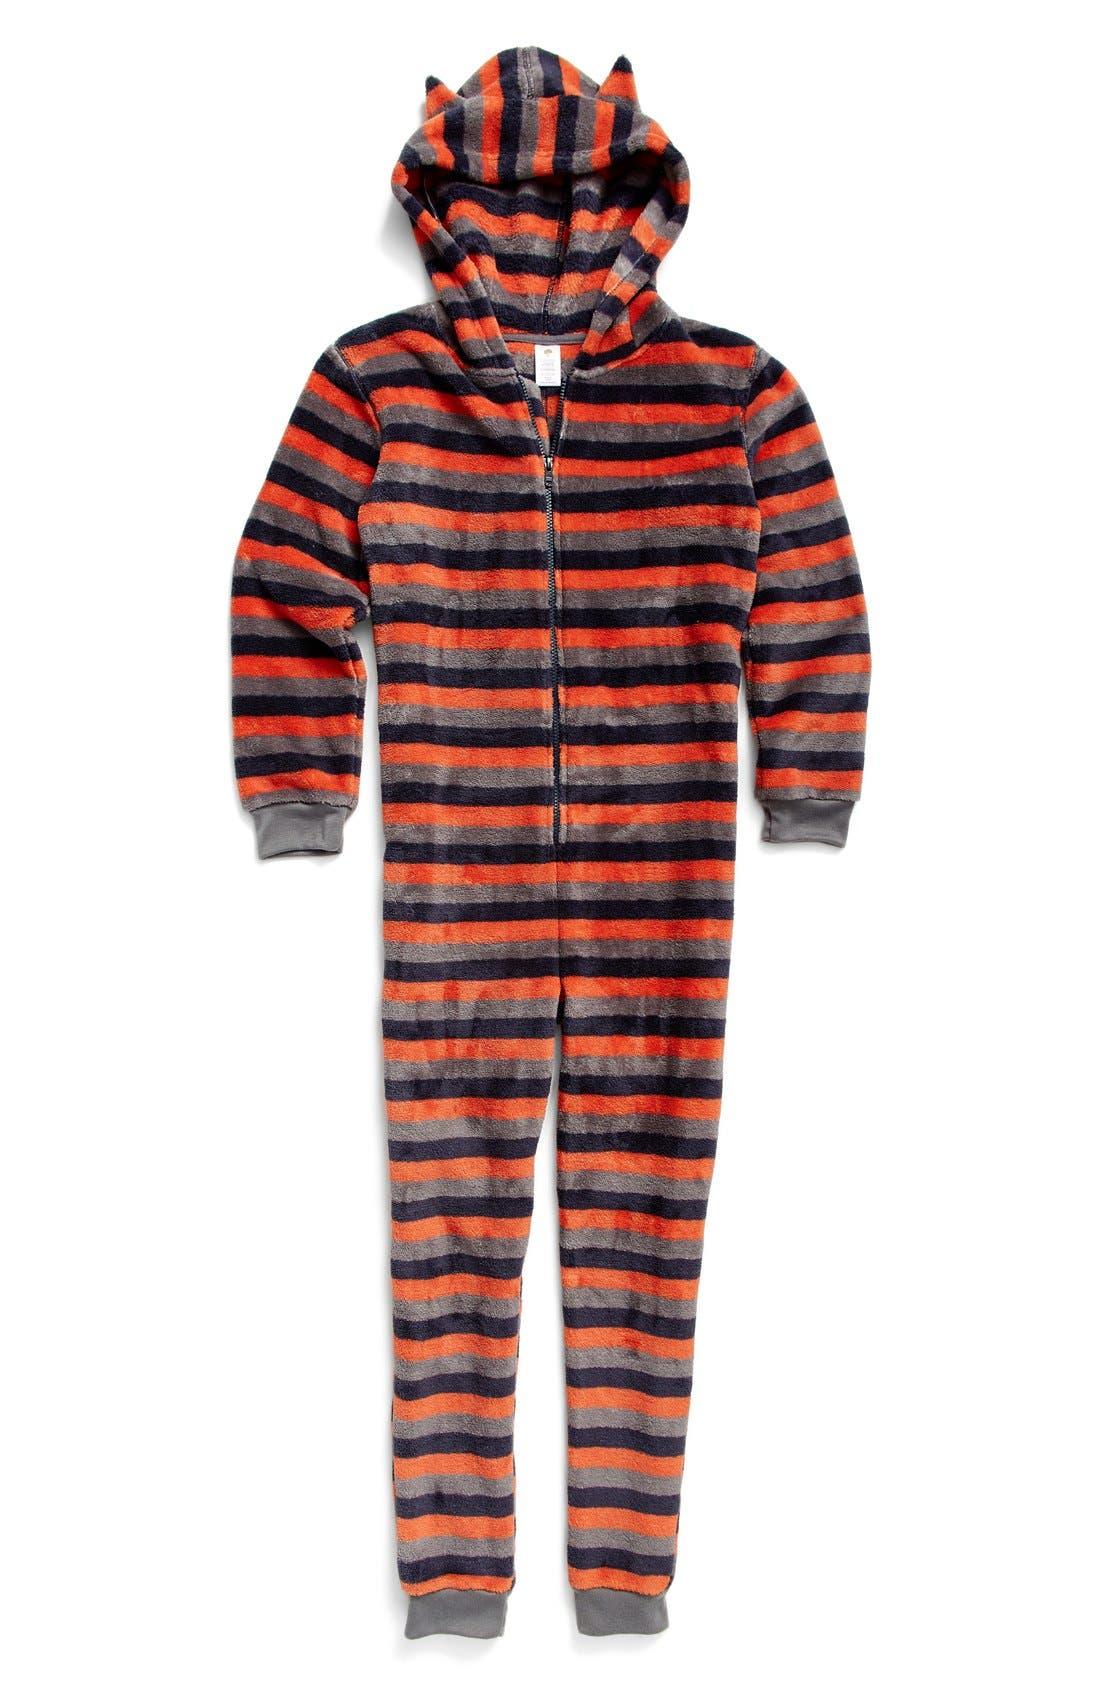 Print Fleece One-Piece Pajamas,                             Main thumbnail 1, color,                             Orange Chili- Navy Stripe